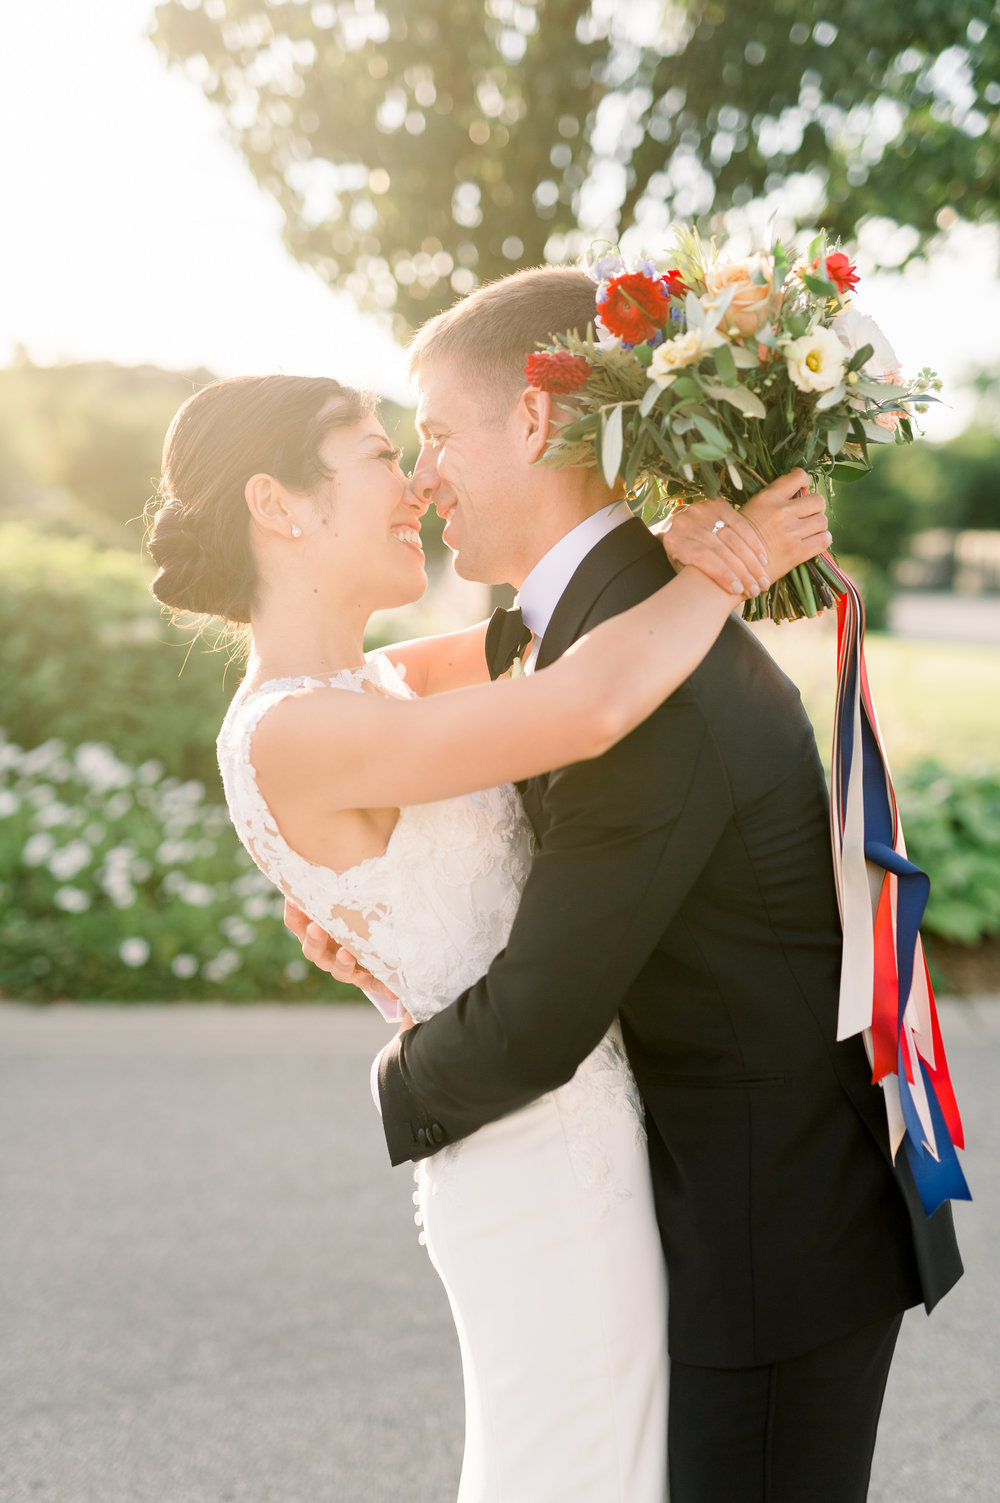 Mamiko-Aaron-Wedding-Whitney-Heard-Photography-7457.jpg